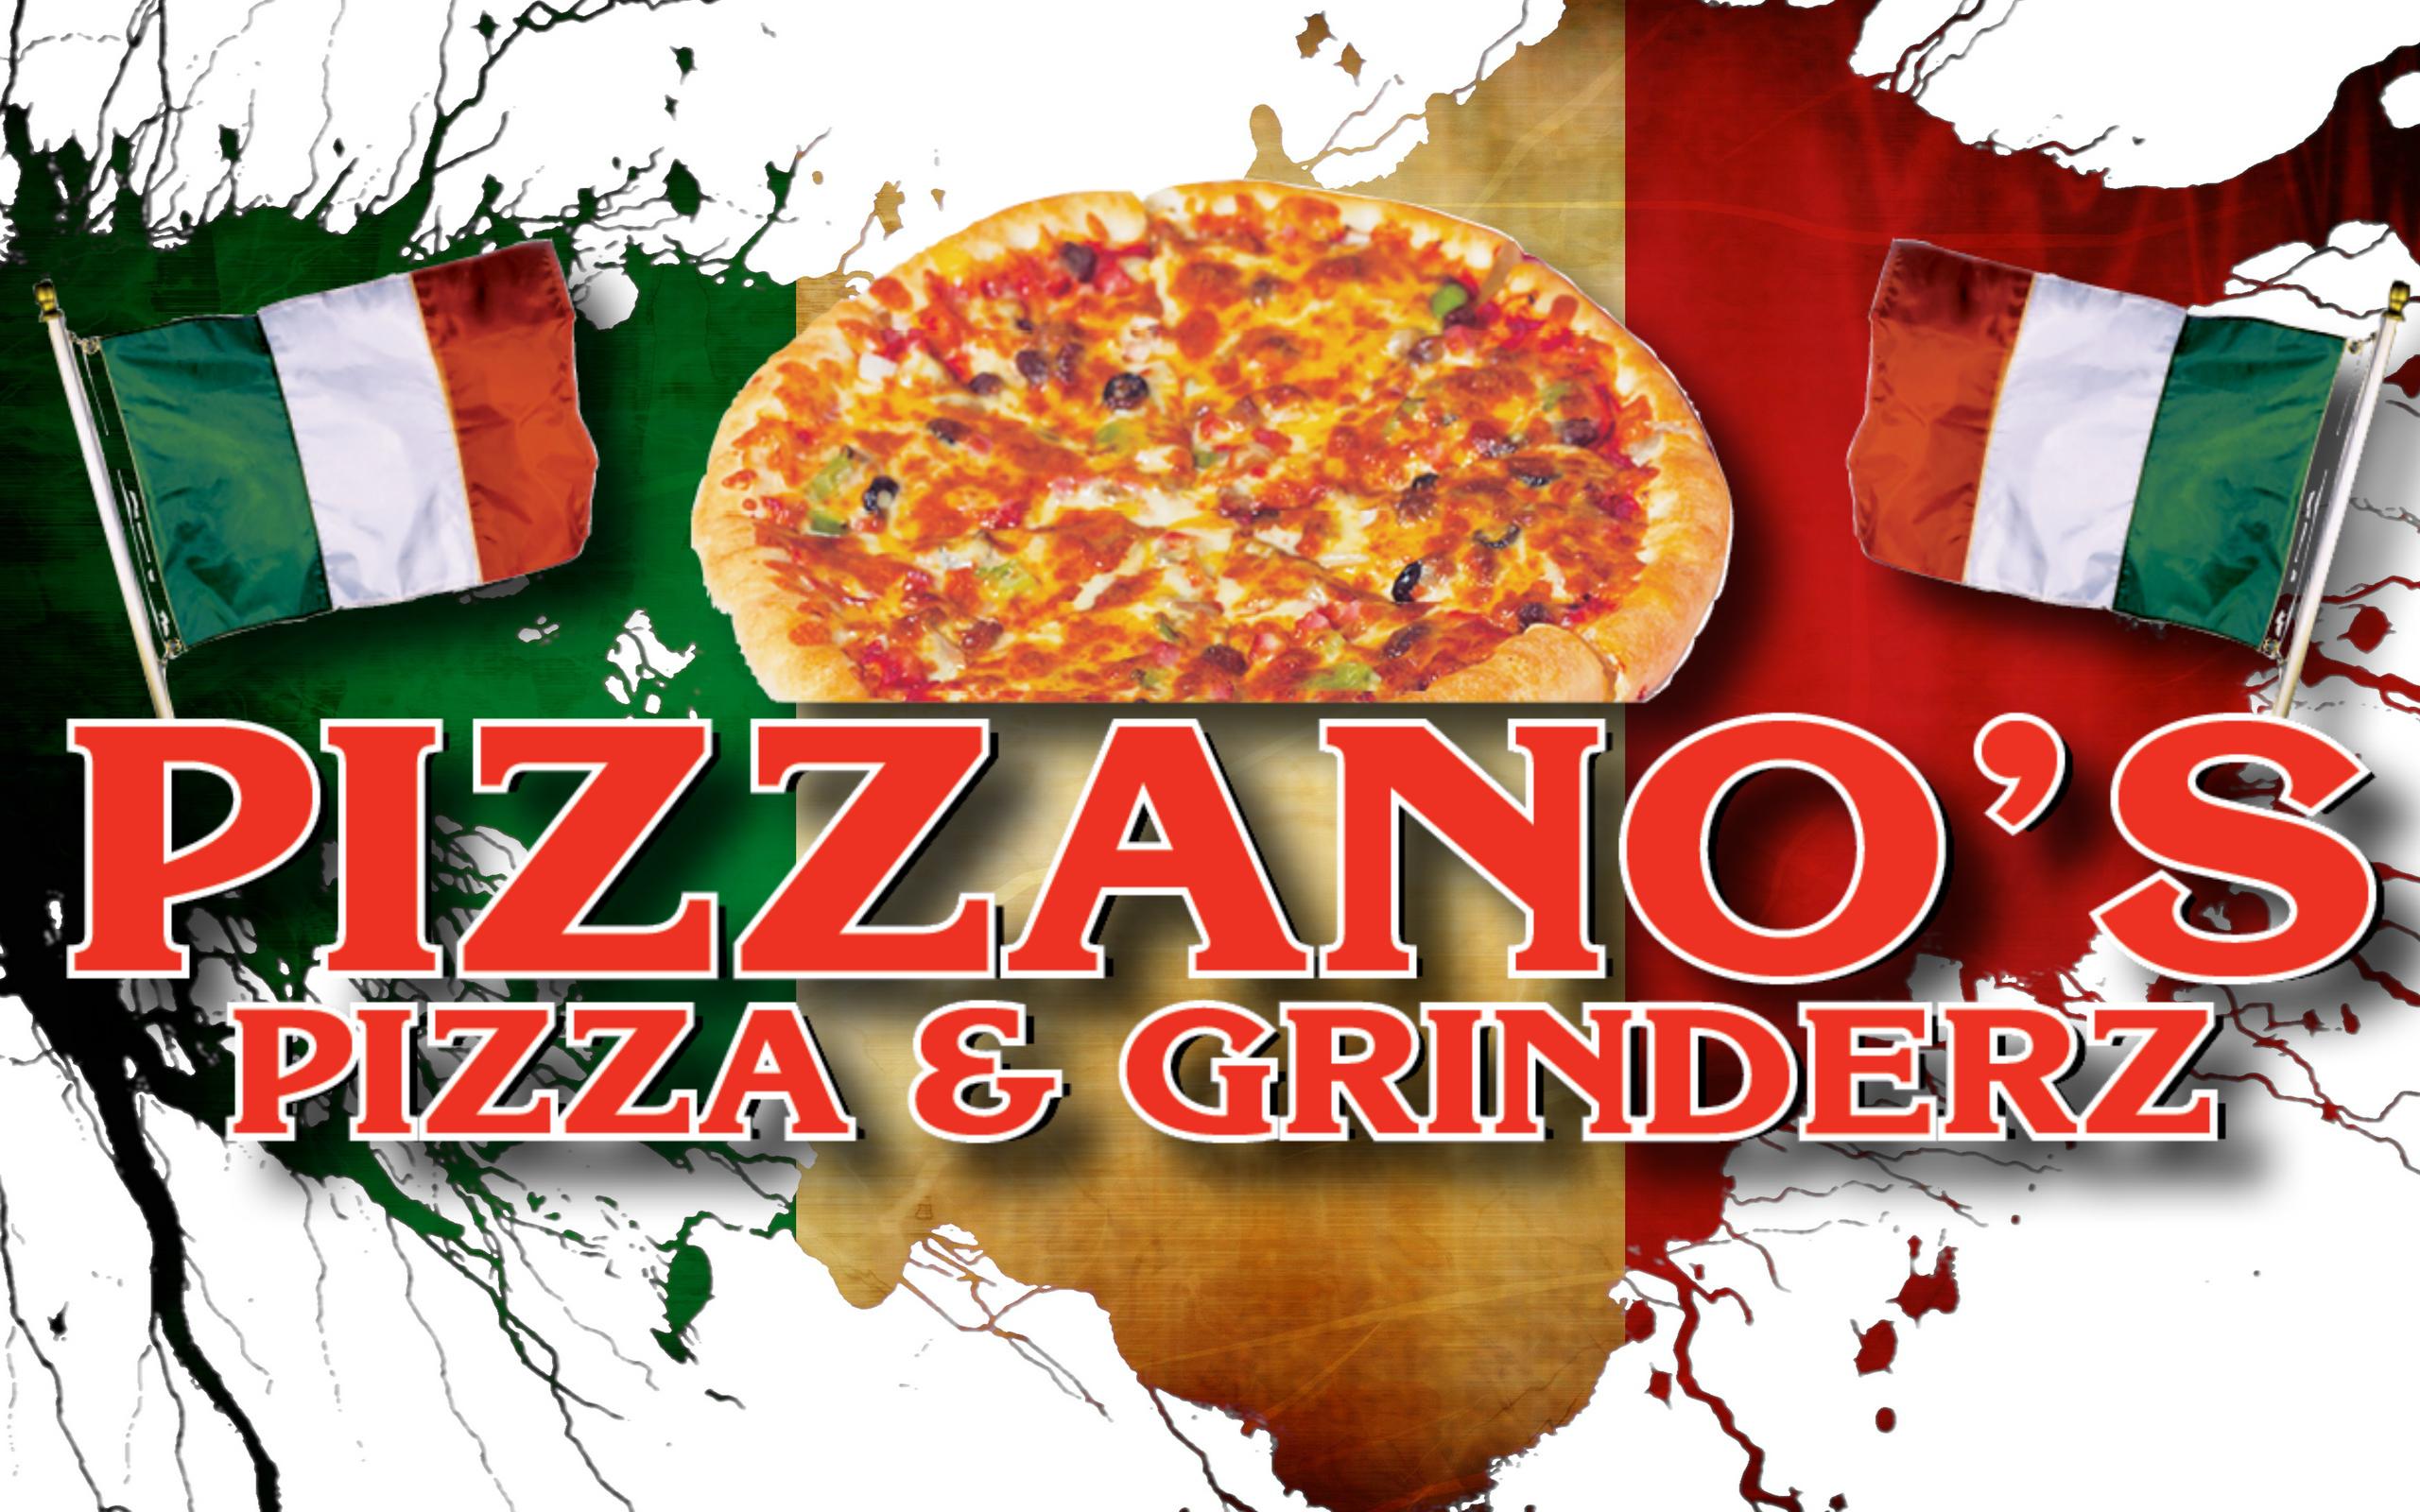 pizzanos order online menu